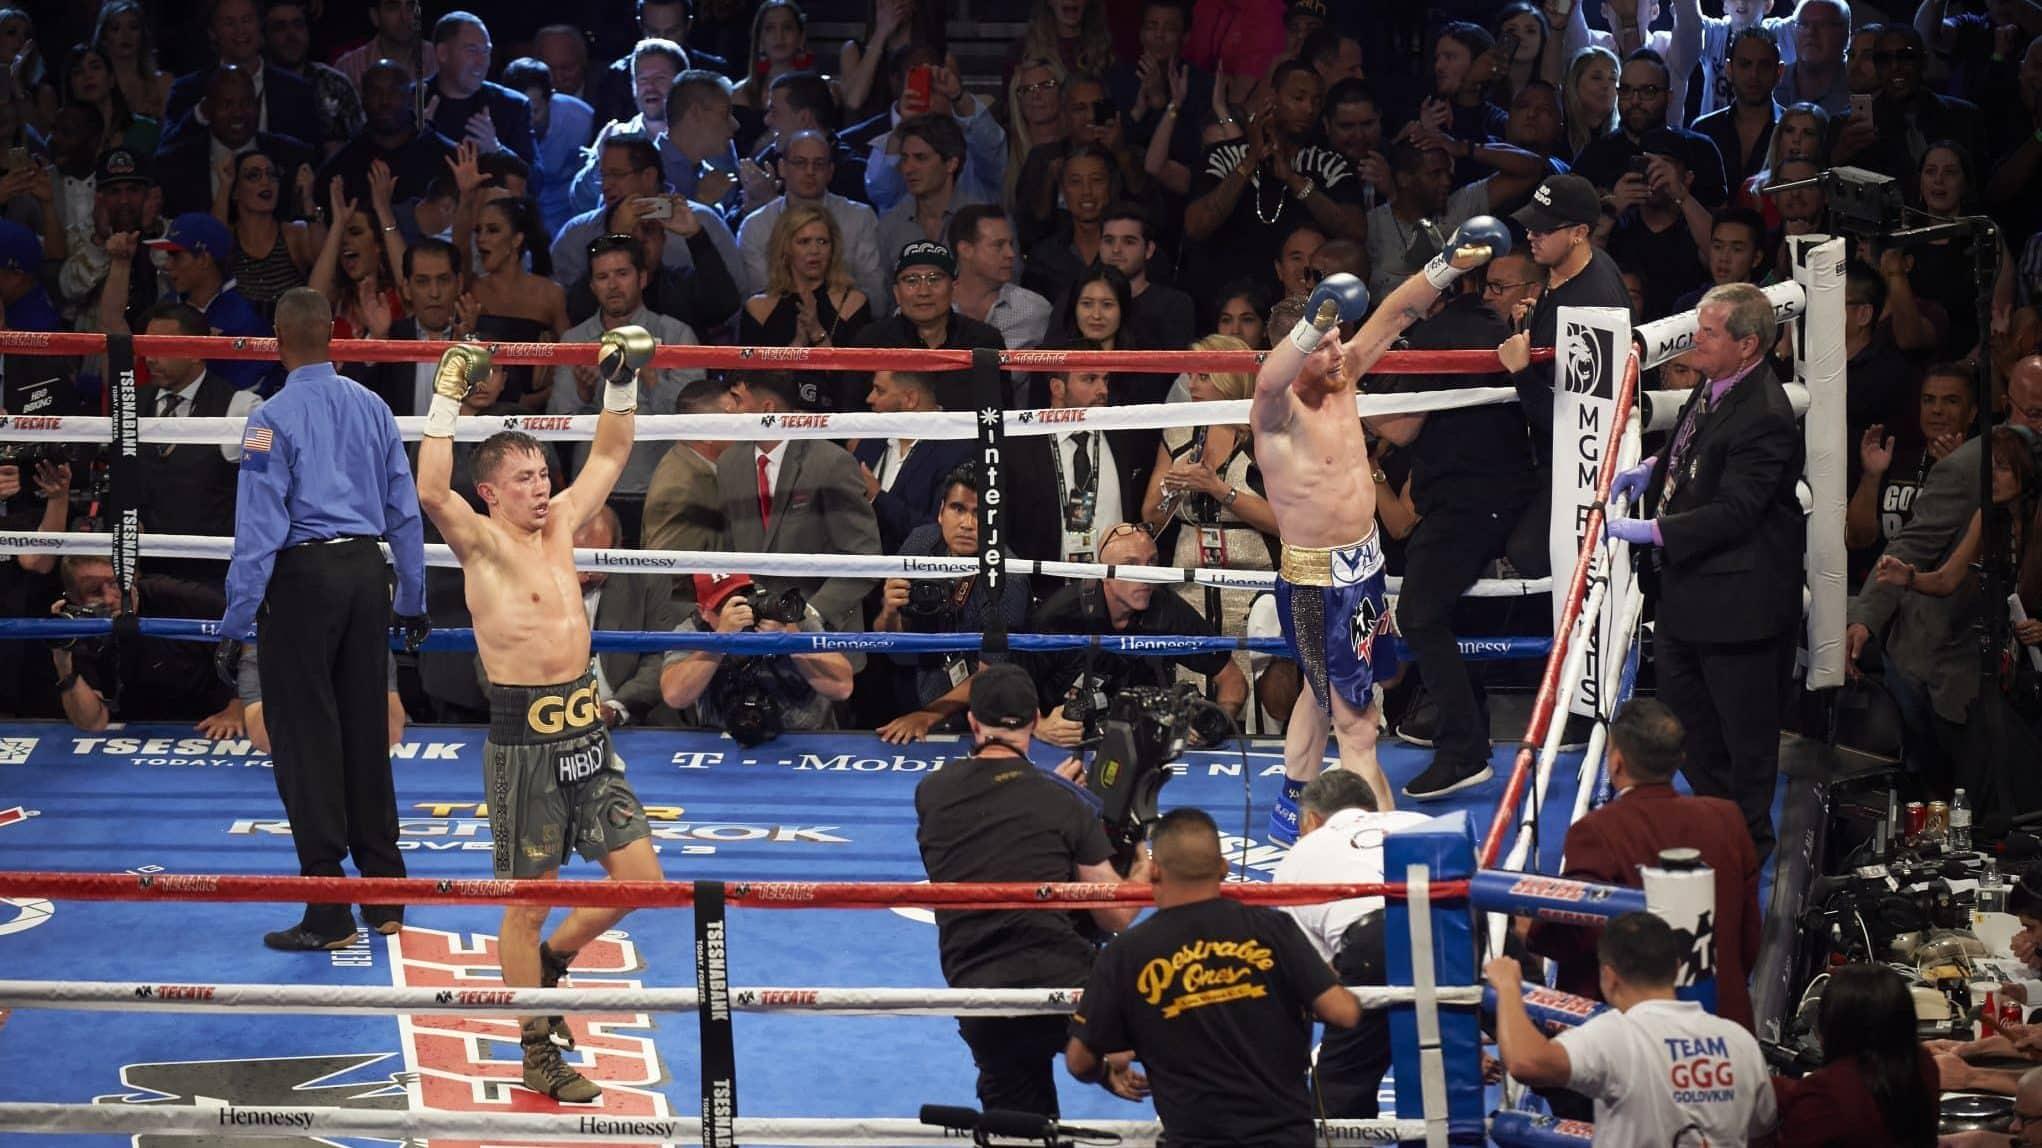 Canelo Alvarez vs Gennady Golovkin, WBA/WBC/IBF/IBO World Middleweight Title